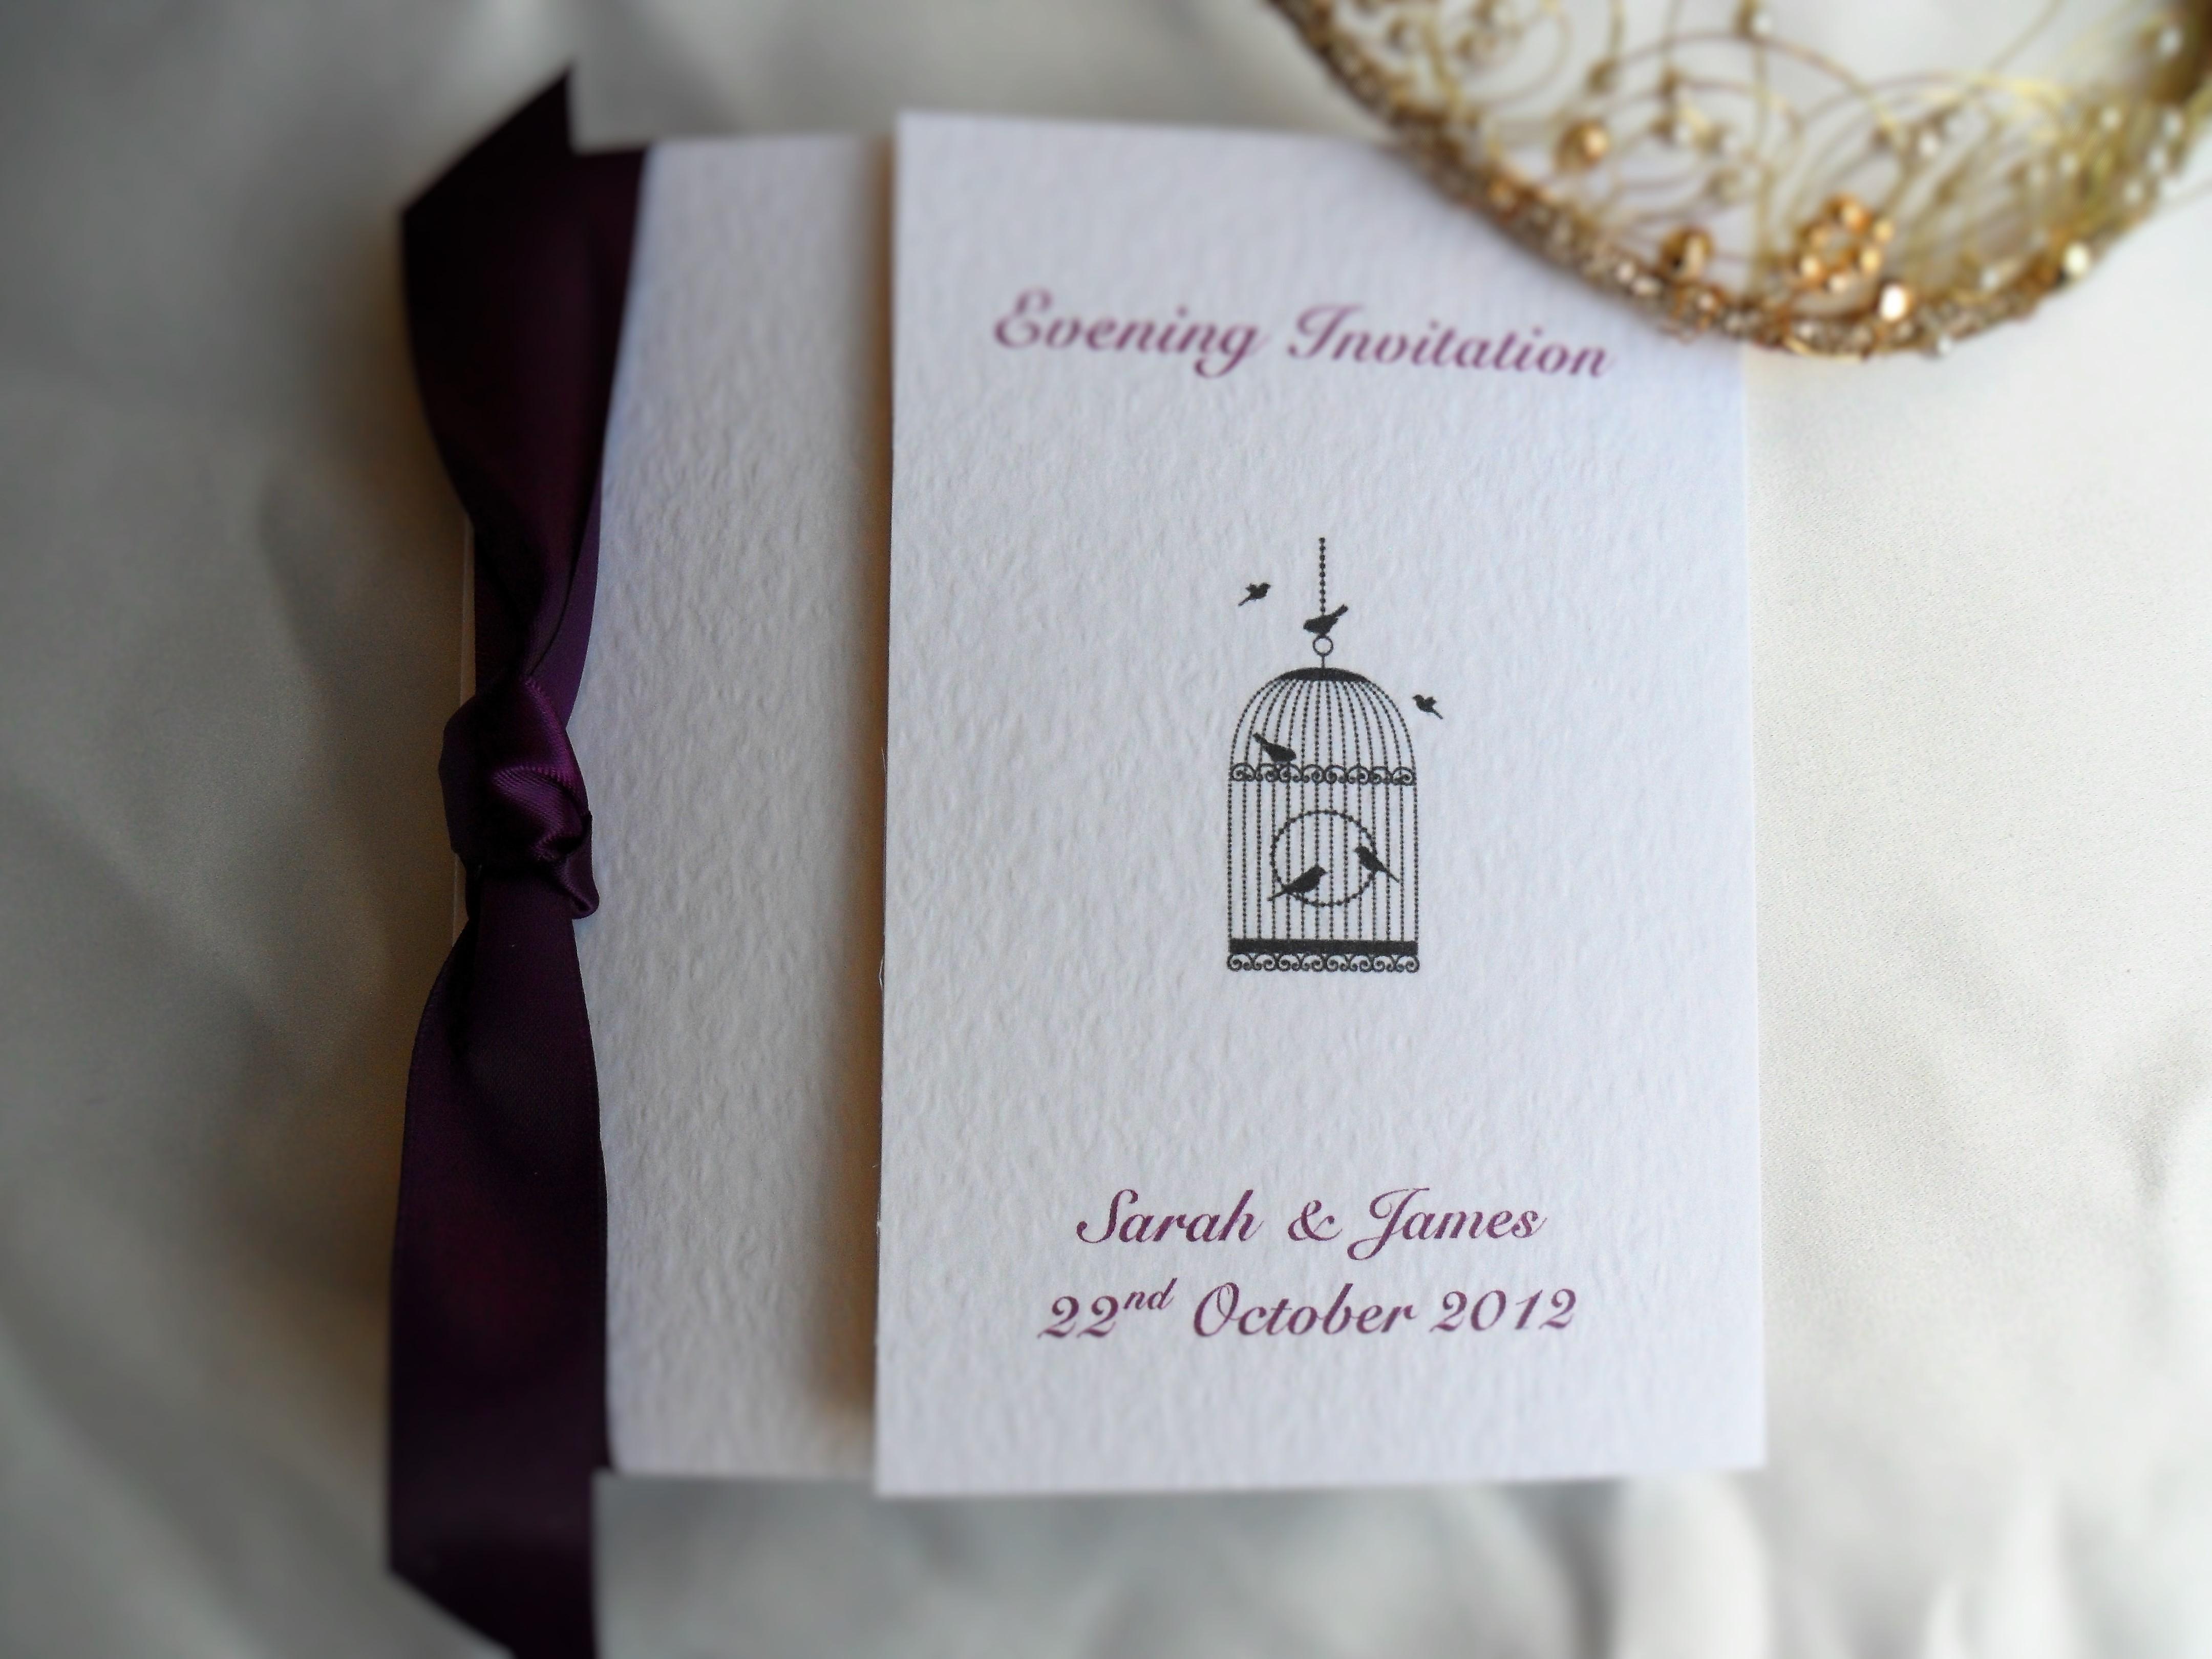 Wedding Invitations Birdcage: Vintage Birdcage Square Gatefold Wedding Invitations